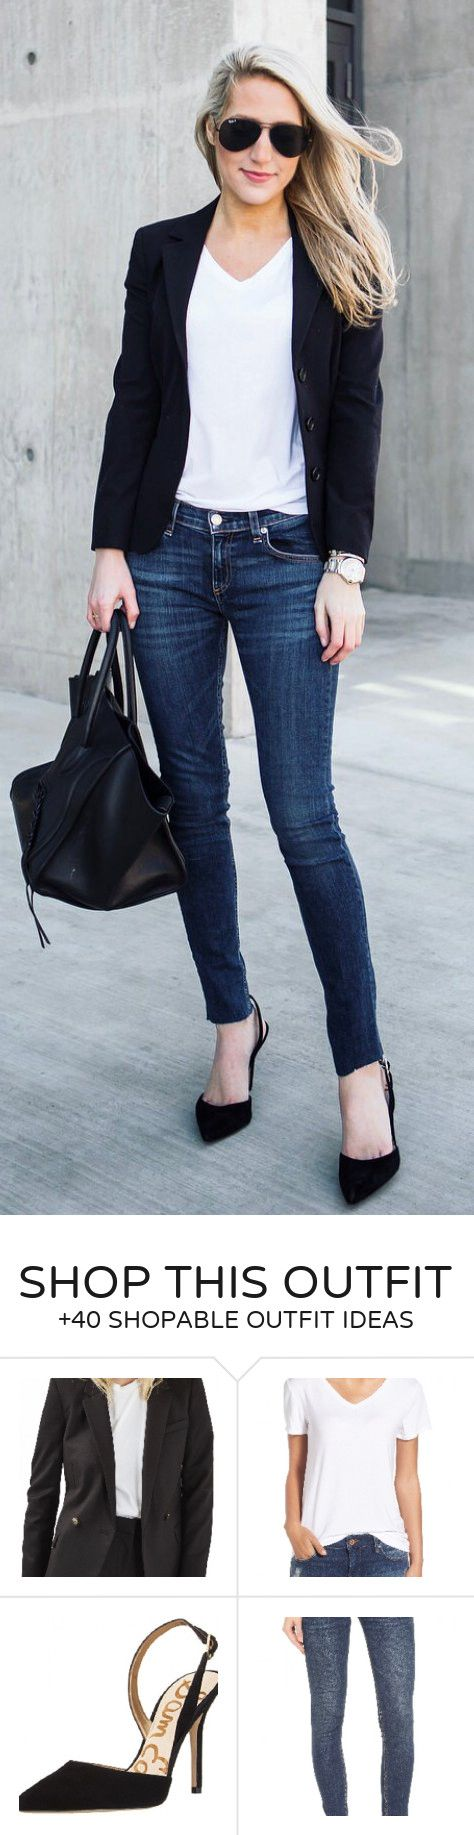 #winter #outfits / Black Blazer / Navy Skinny Jeans / Black Pumps / Black Leather Tote Bag / White Top